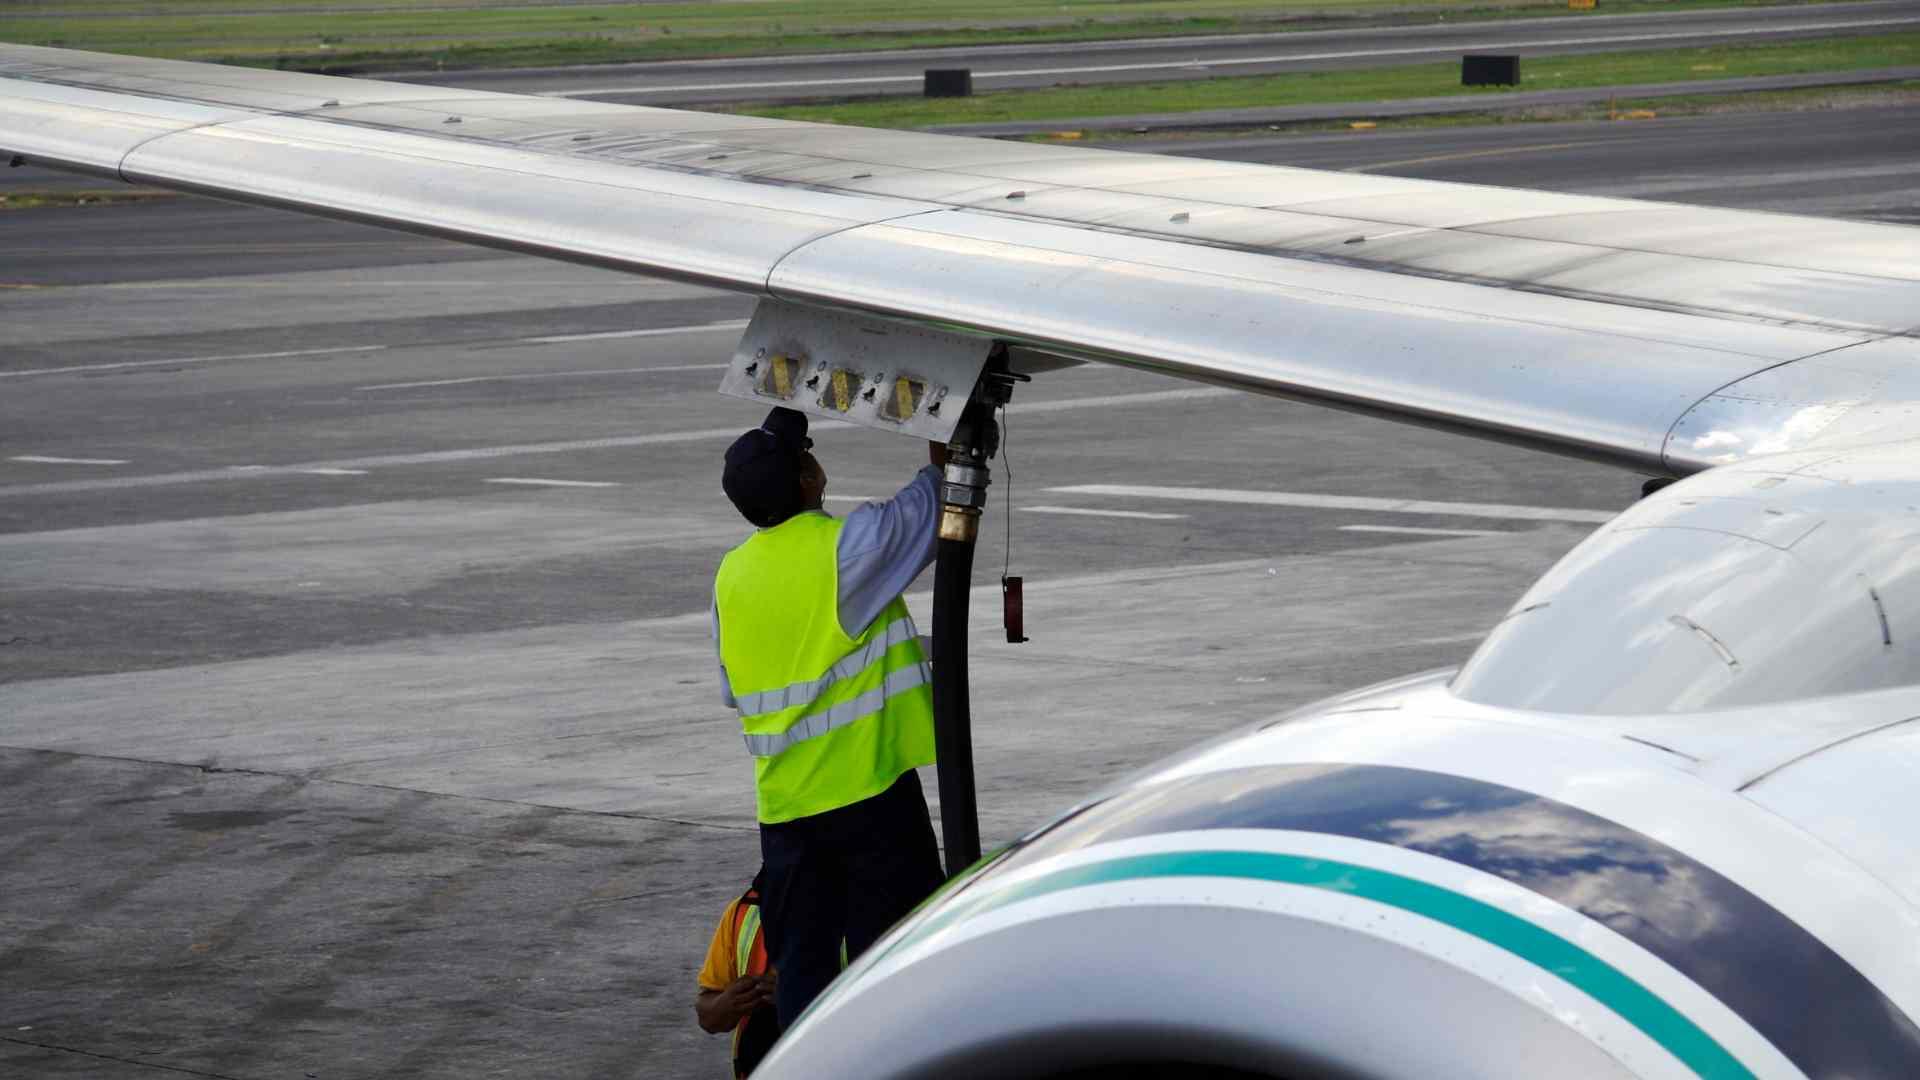 An aeroplane being refuelled with aviation kerosene.